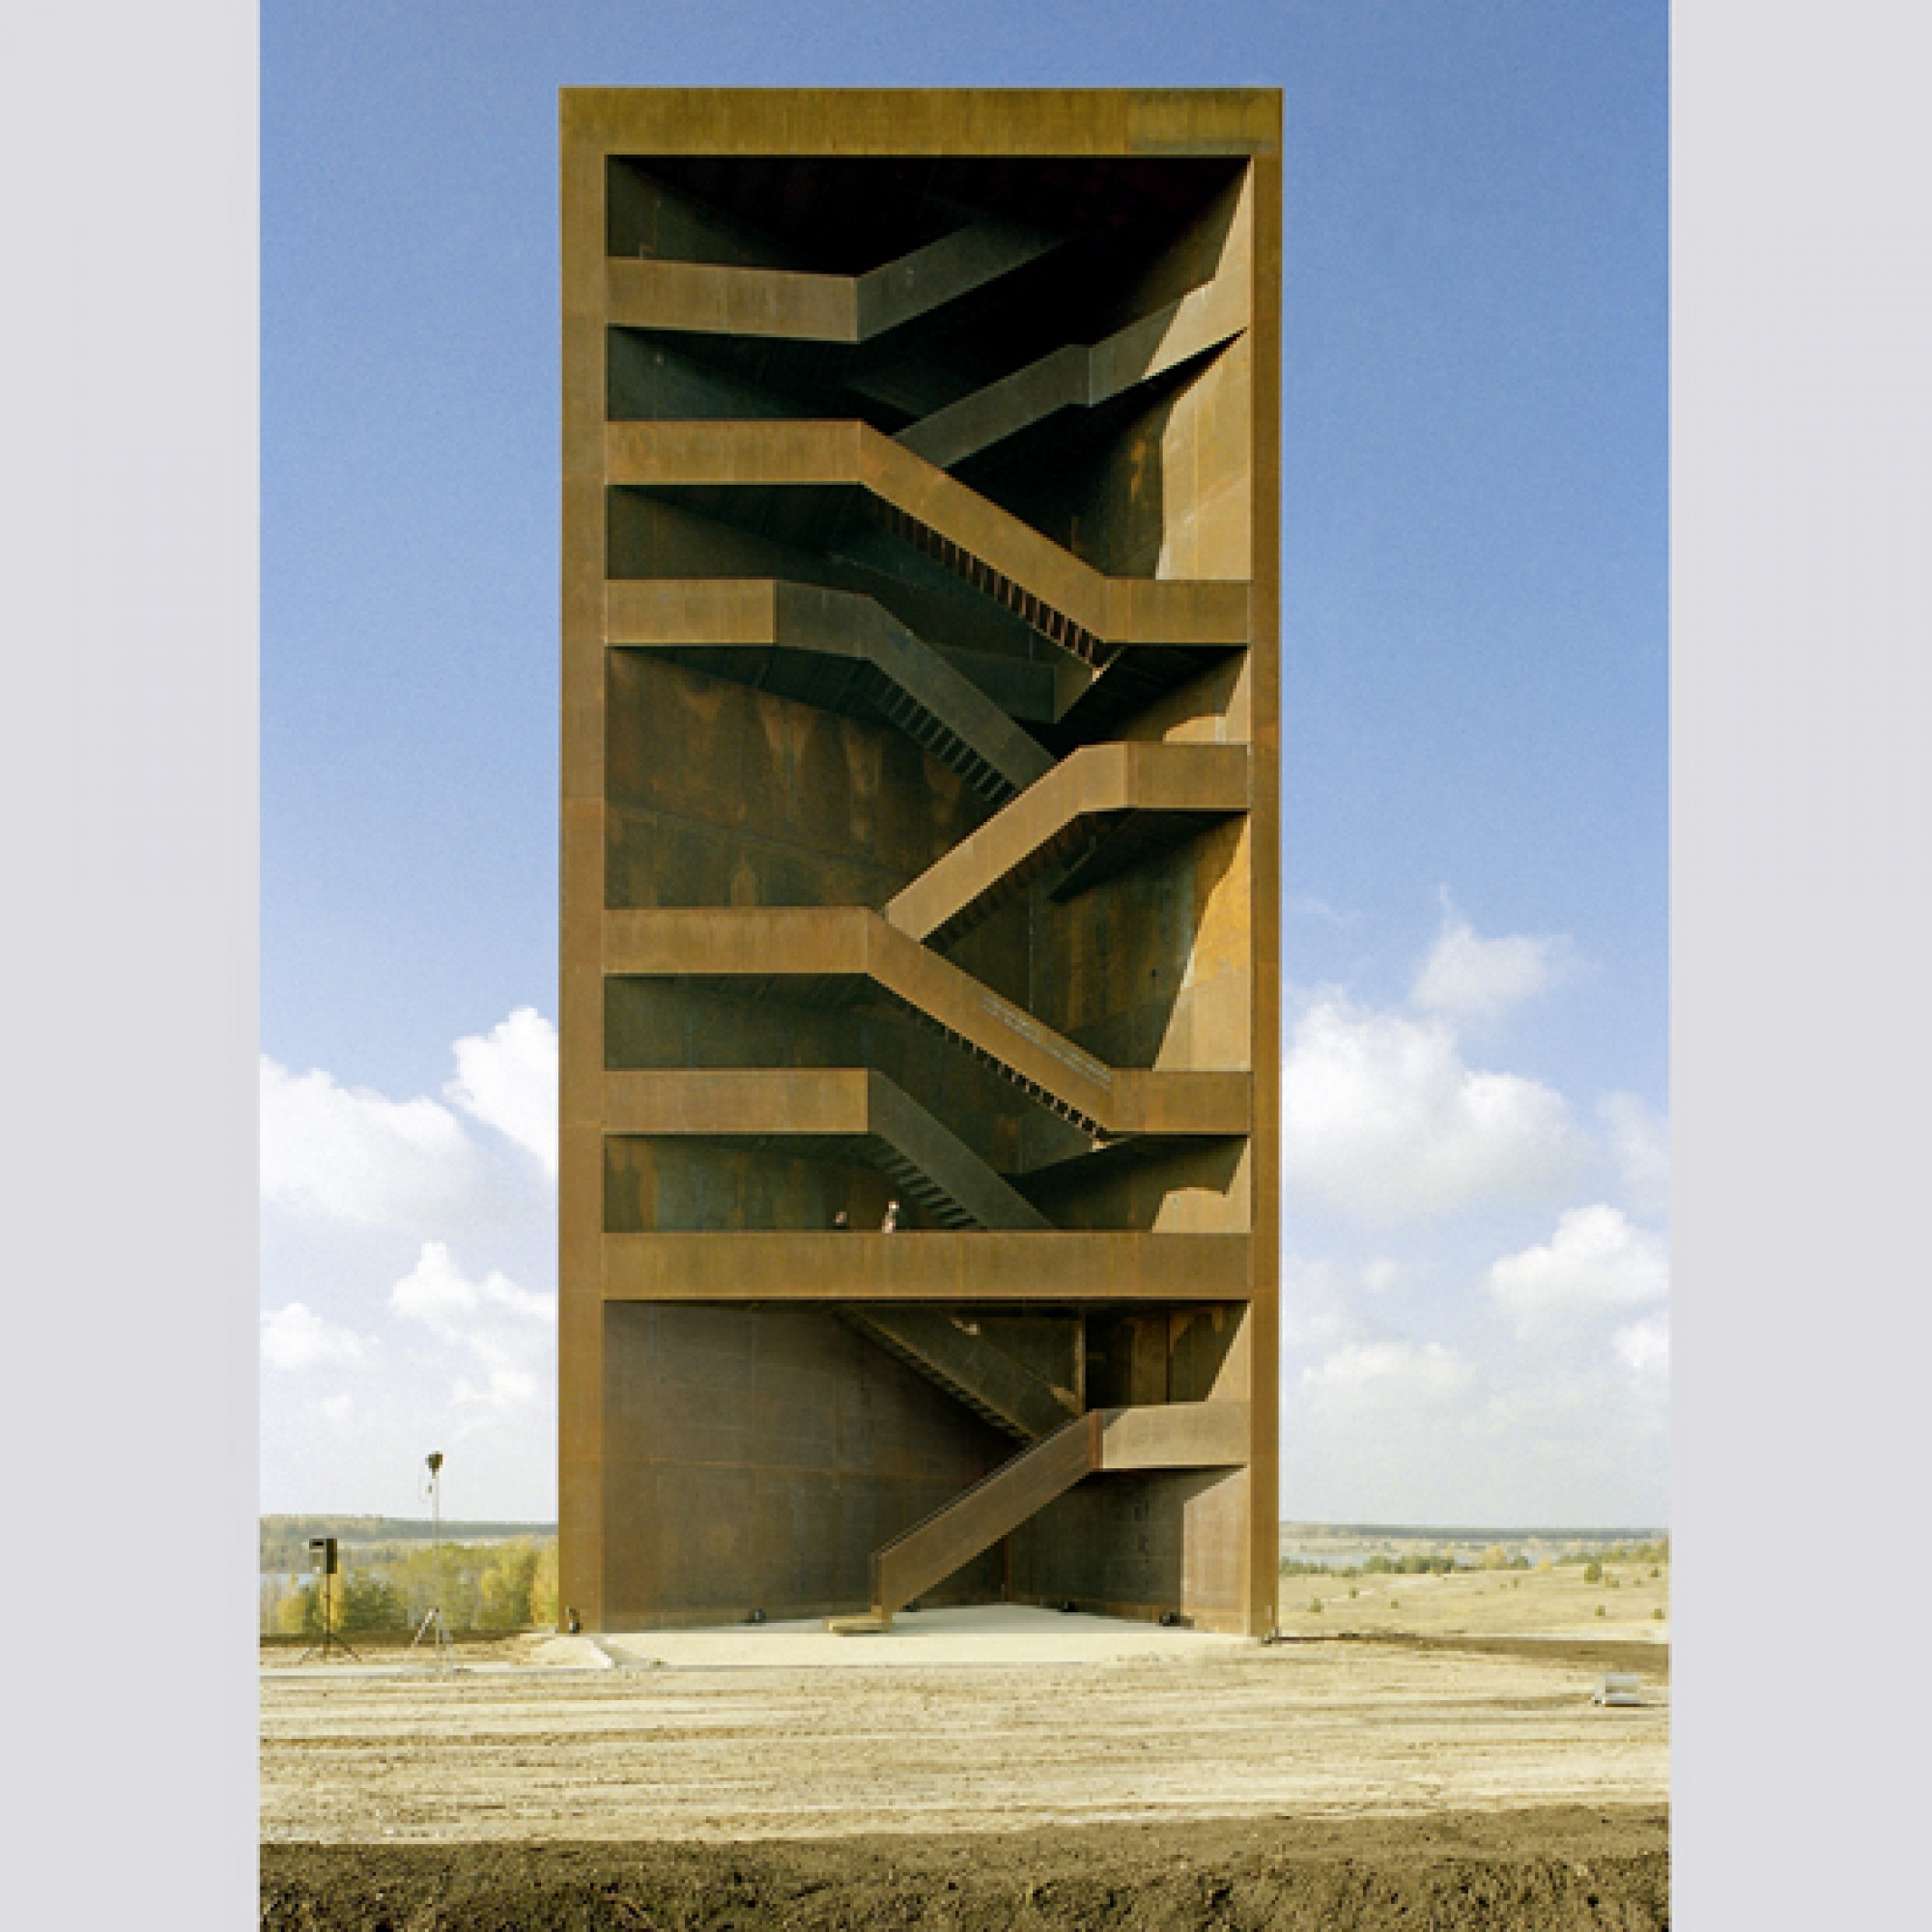 Architektur & Landschaft, Stefan Giers